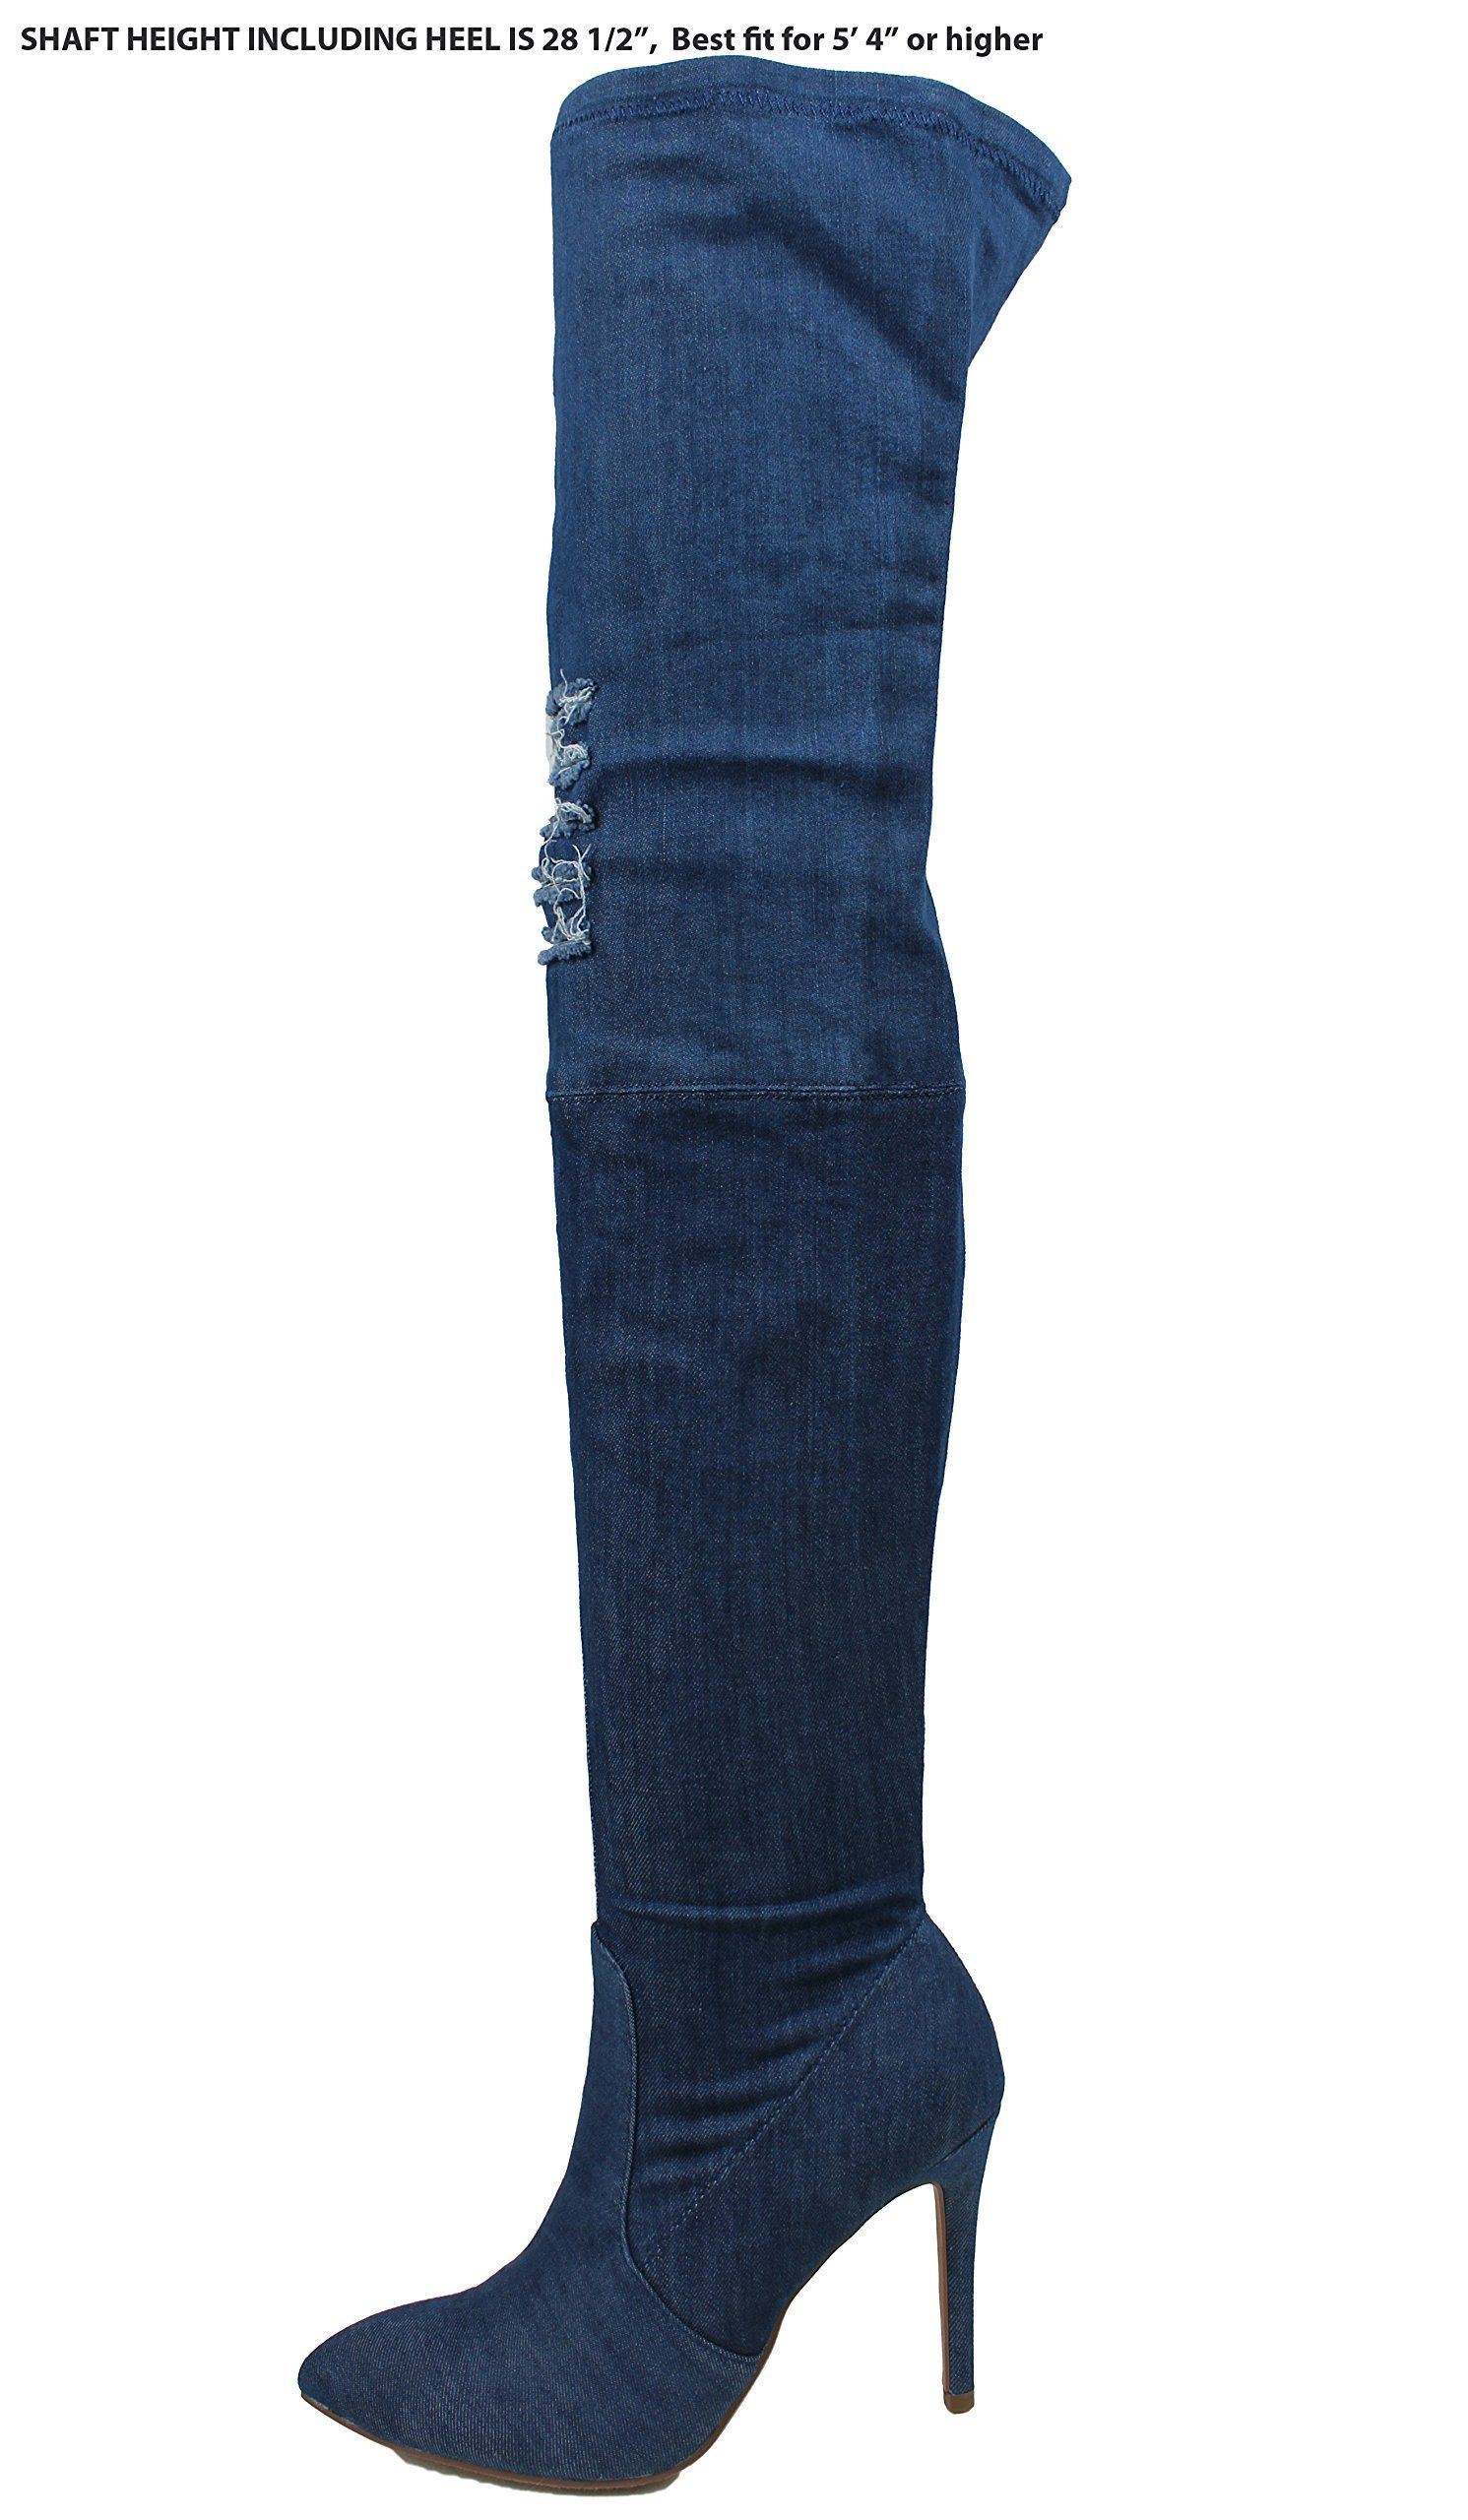 Delicious Damenschuhe Knee Stretch Denim Ripped Jean Thigh High Over Knee Damenschuhe ... b4b0f4